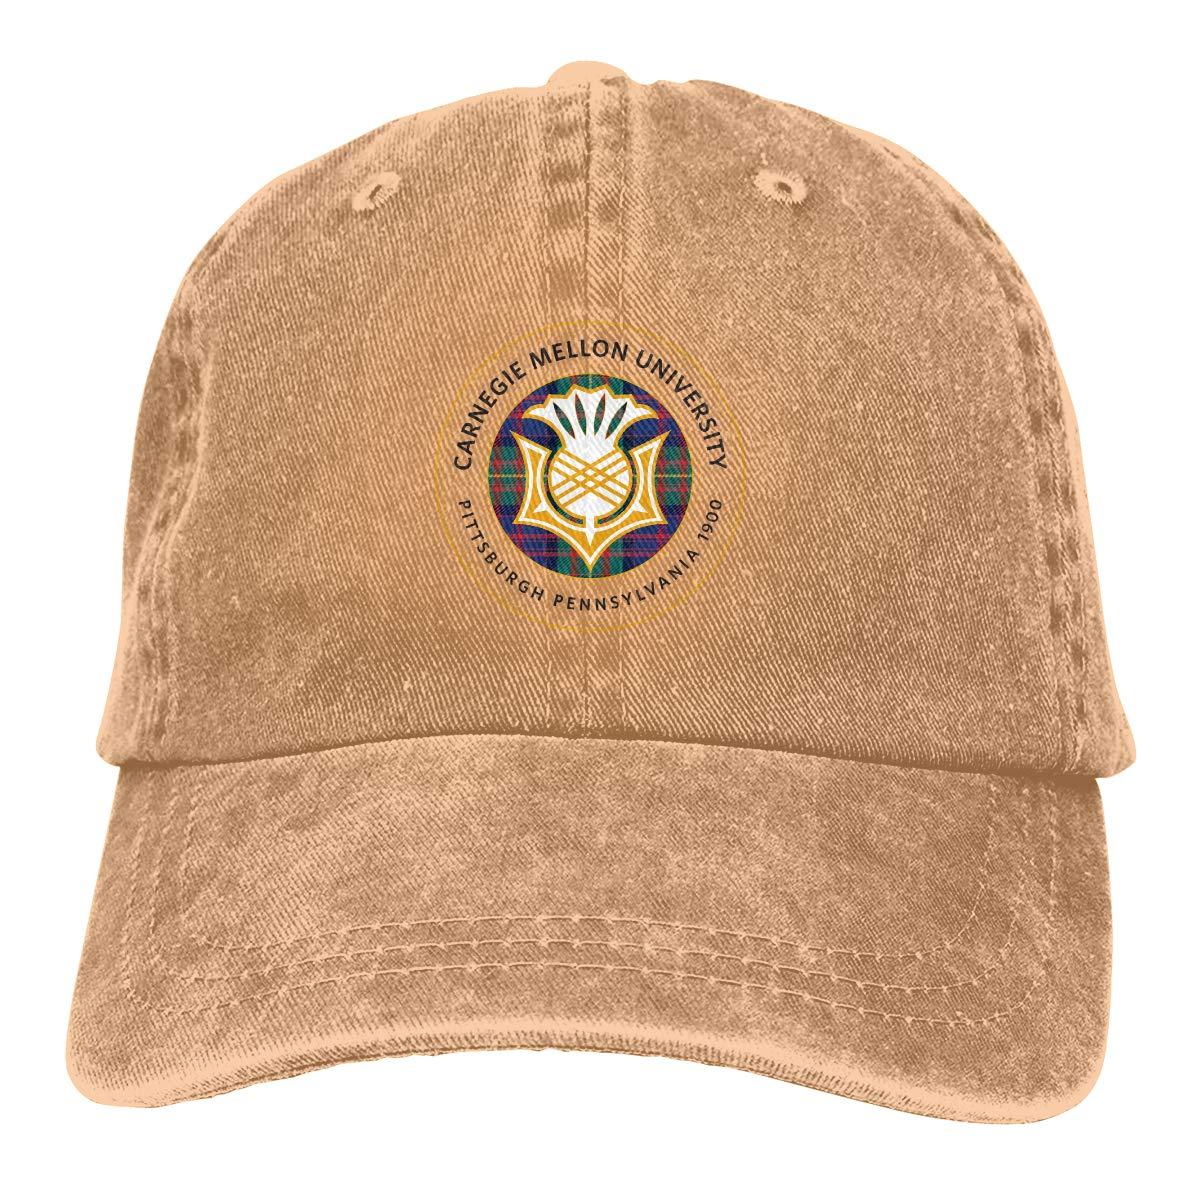 Eugrandet Carnegie Mellon University Geek Unisex Baseball Cap Twill Adjustable Hat